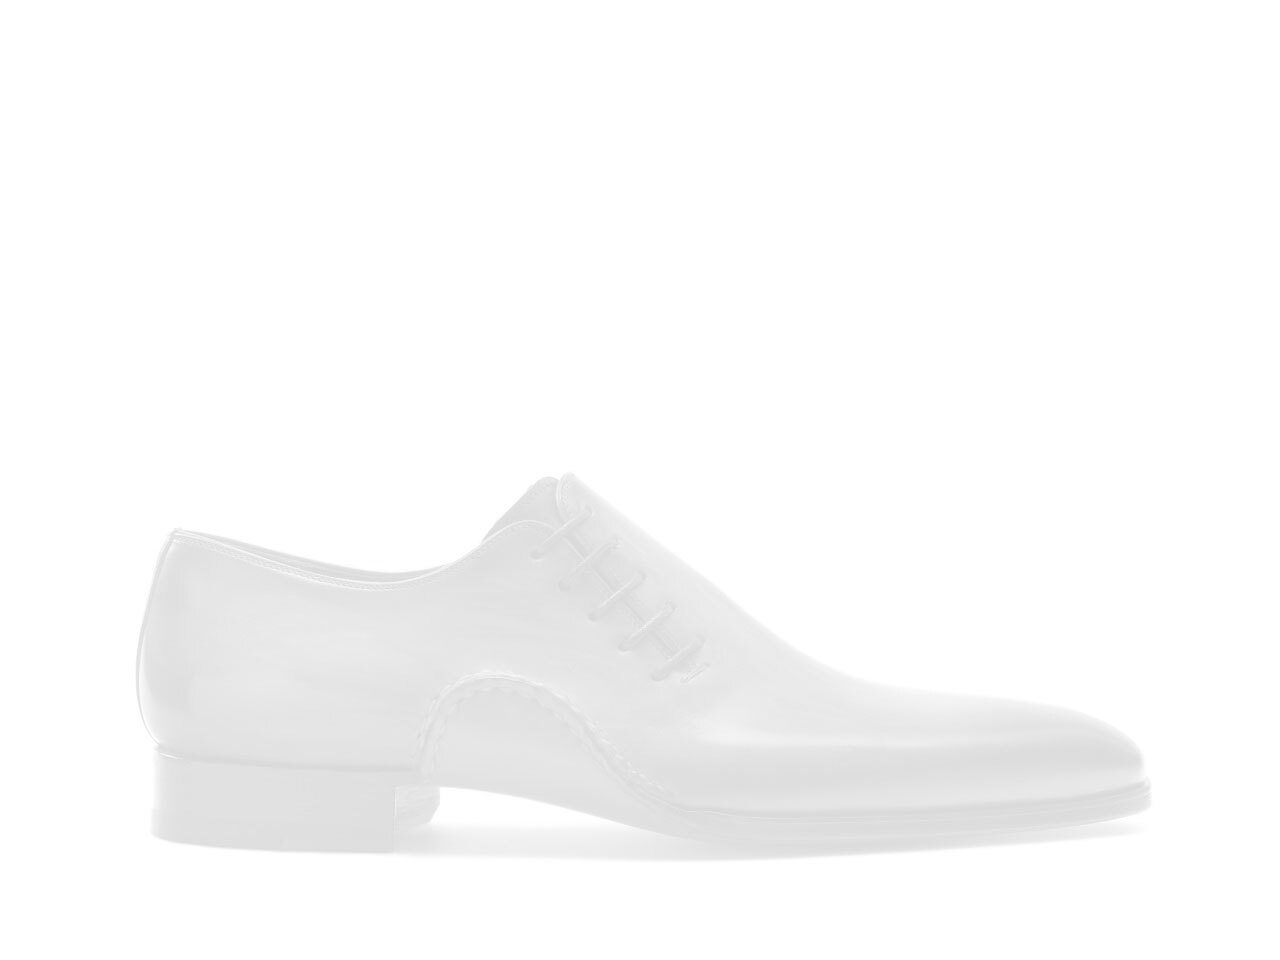 Sole of the Magnanni Feroz Midbrown Suede Men's Designer Boots